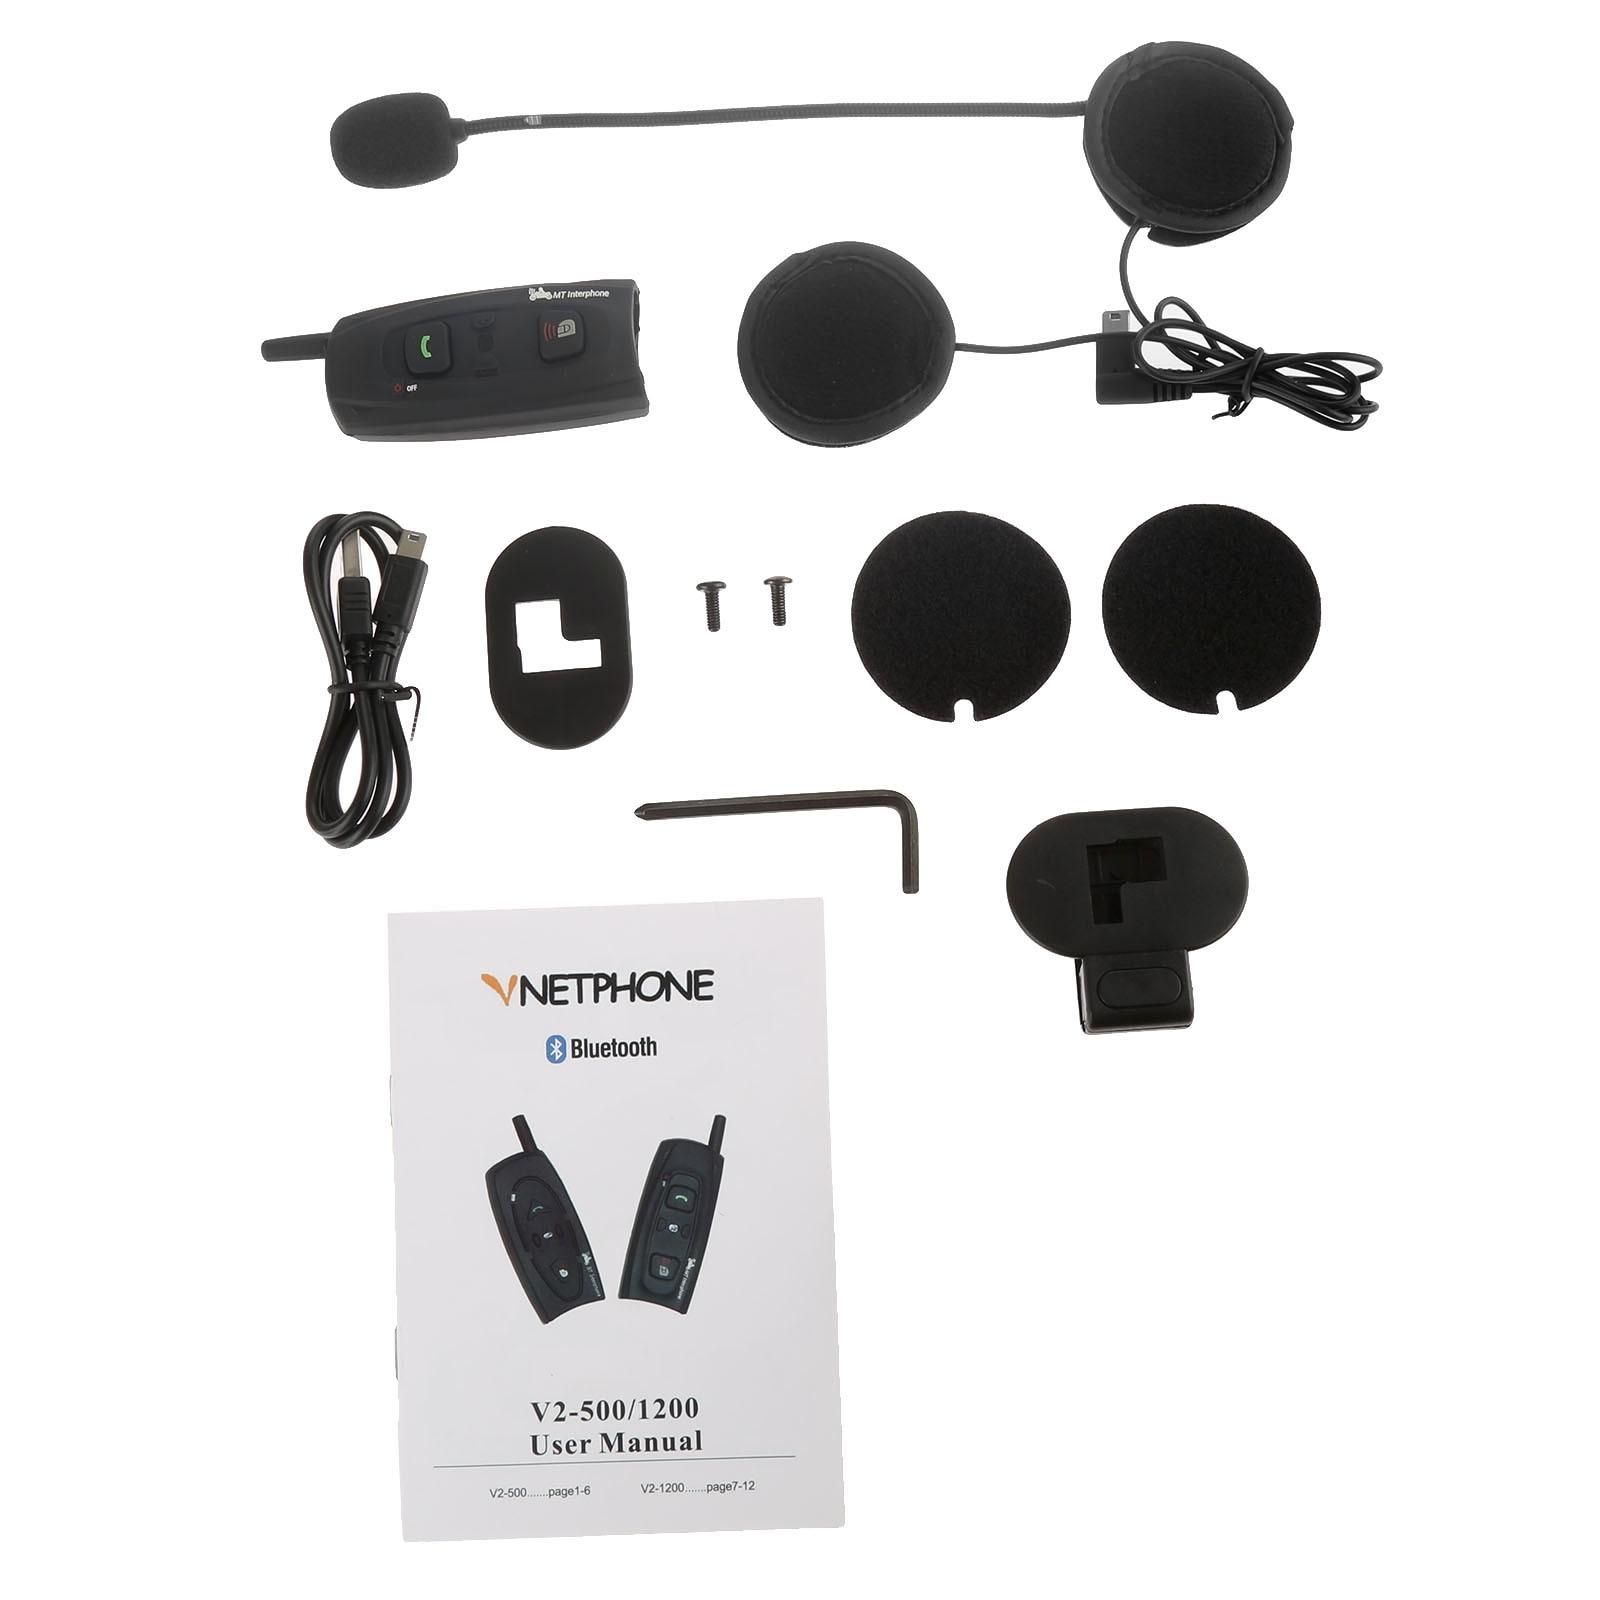 bt interphone wireless bluetooth motorcycle intercom helmet headset v2 1200 full duplex 1000. Black Bedroom Furniture Sets. Home Design Ideas